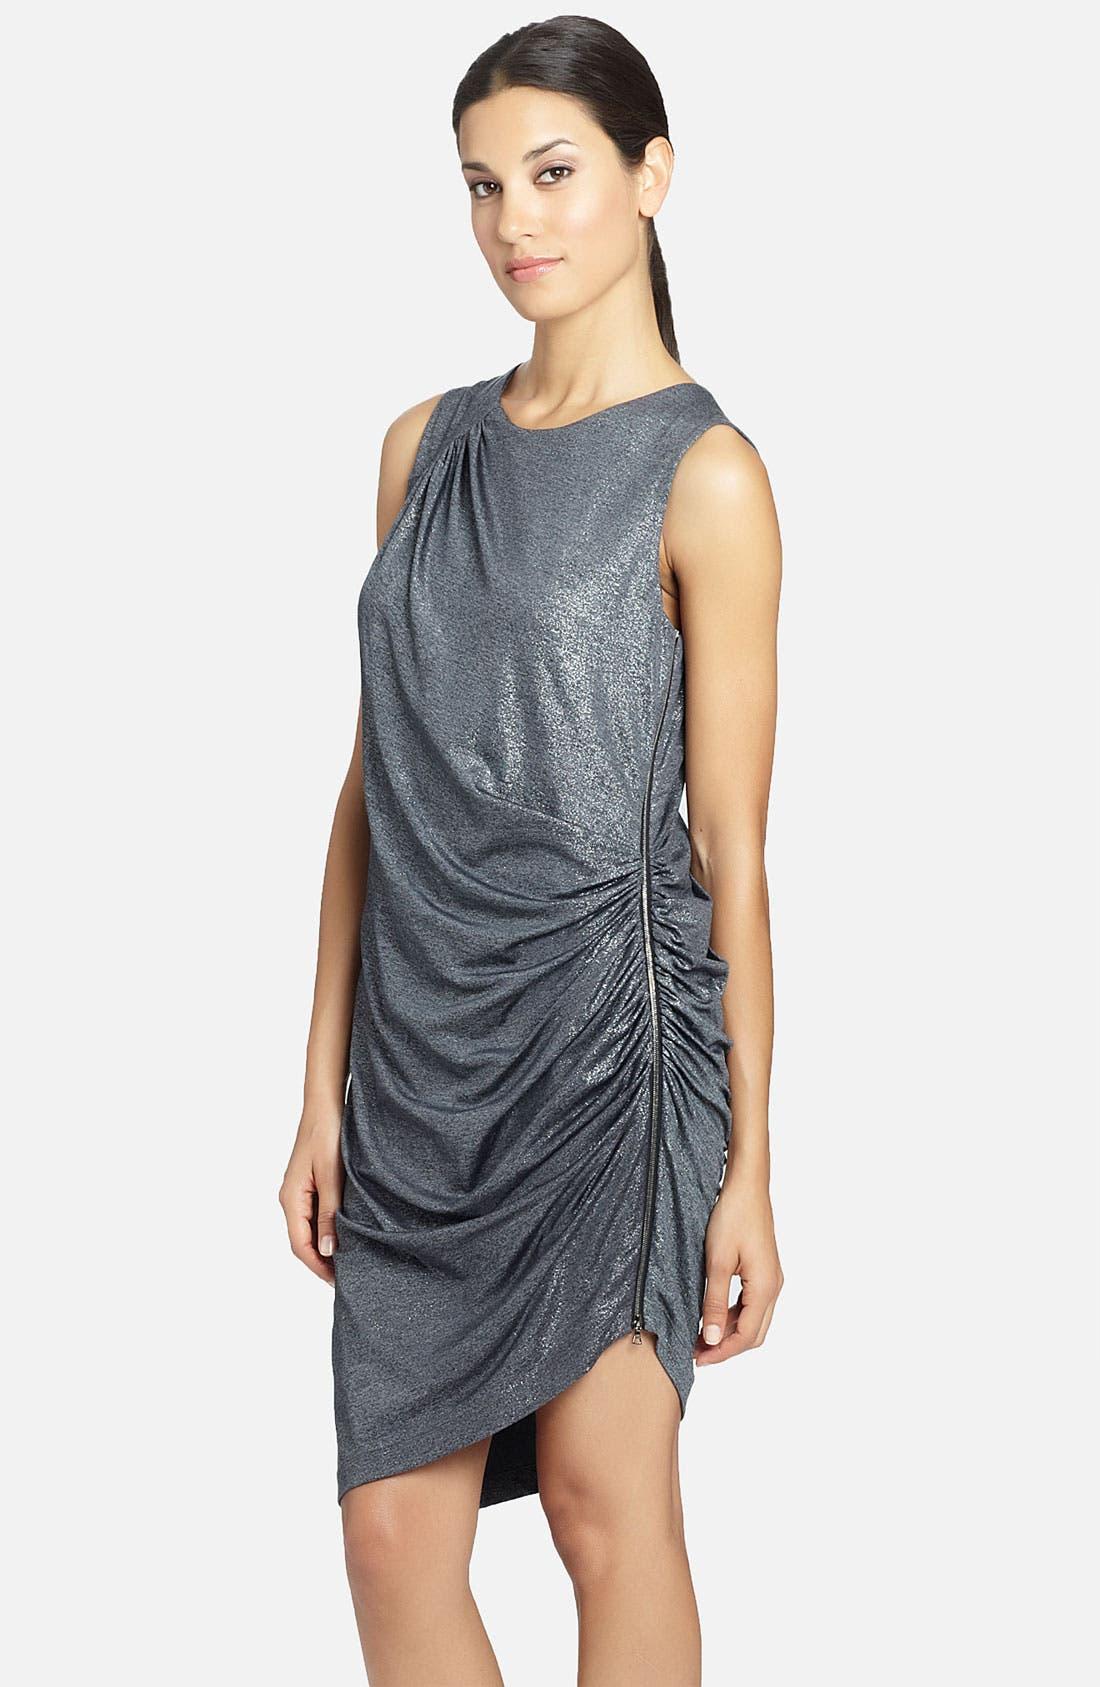 Alternate Image 1 Selected - Cynthia Steffe 'Rianna' Side Zip Metallic Dress